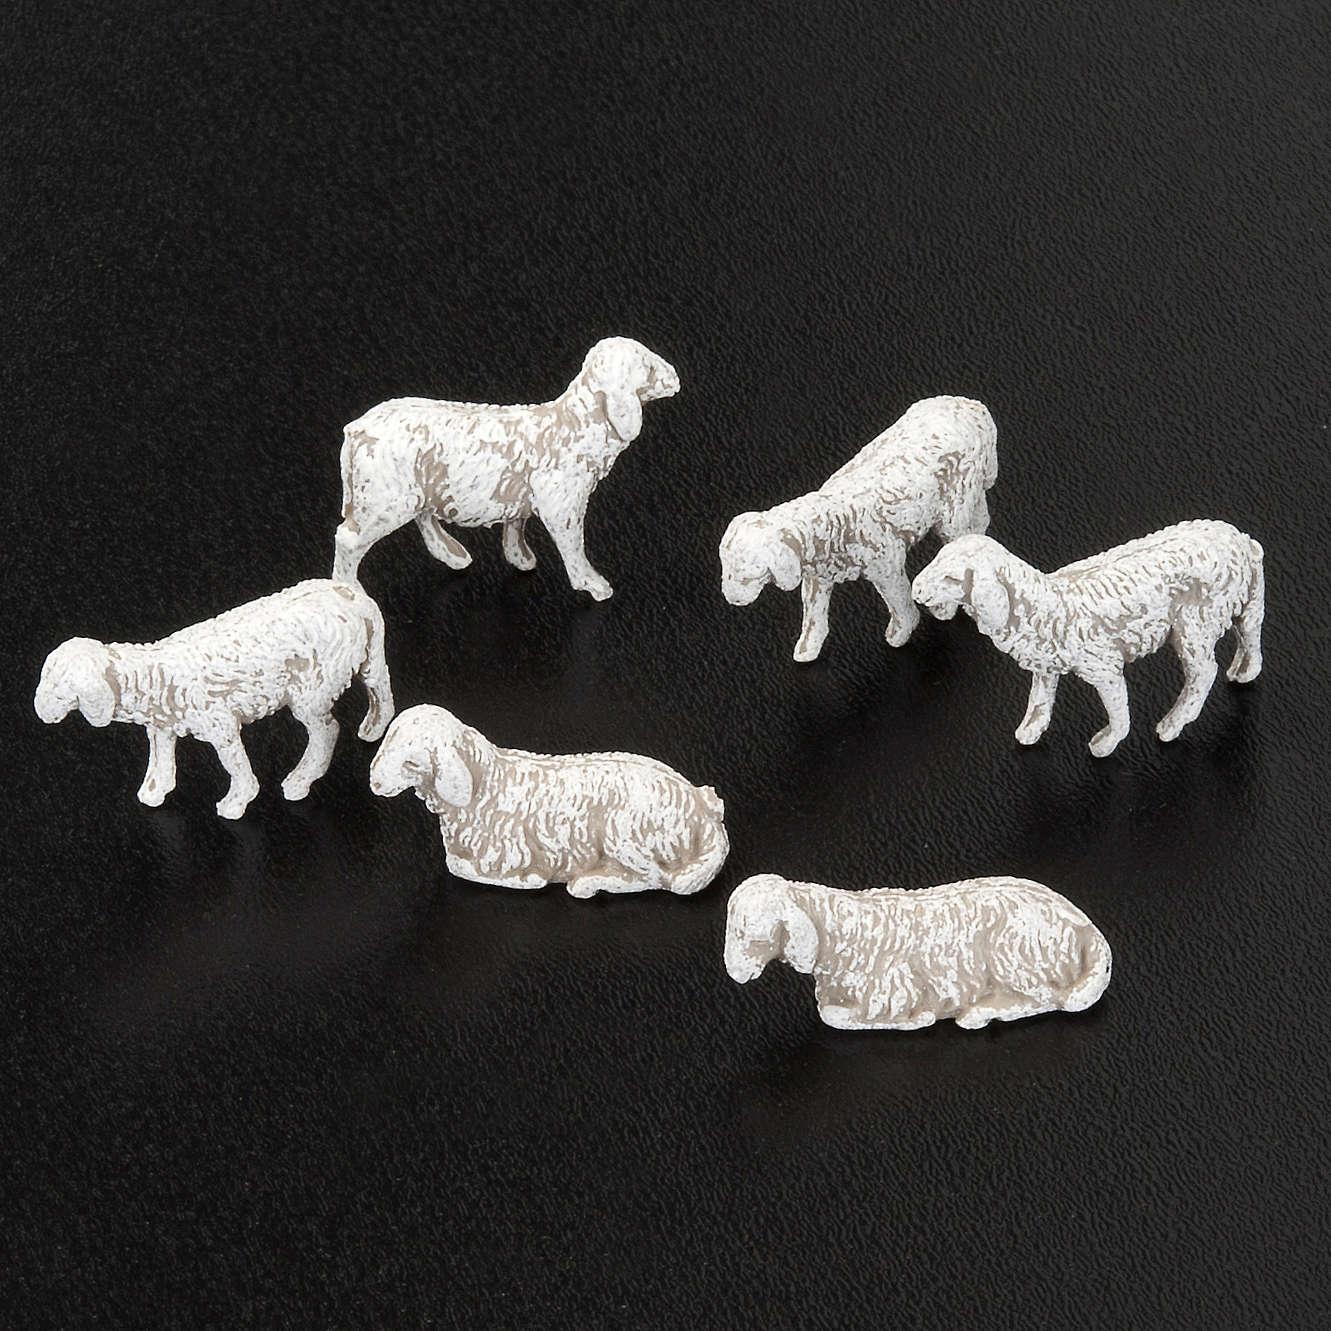 Nativity scene figurines, sheep 1 cm, 6 pieces 3